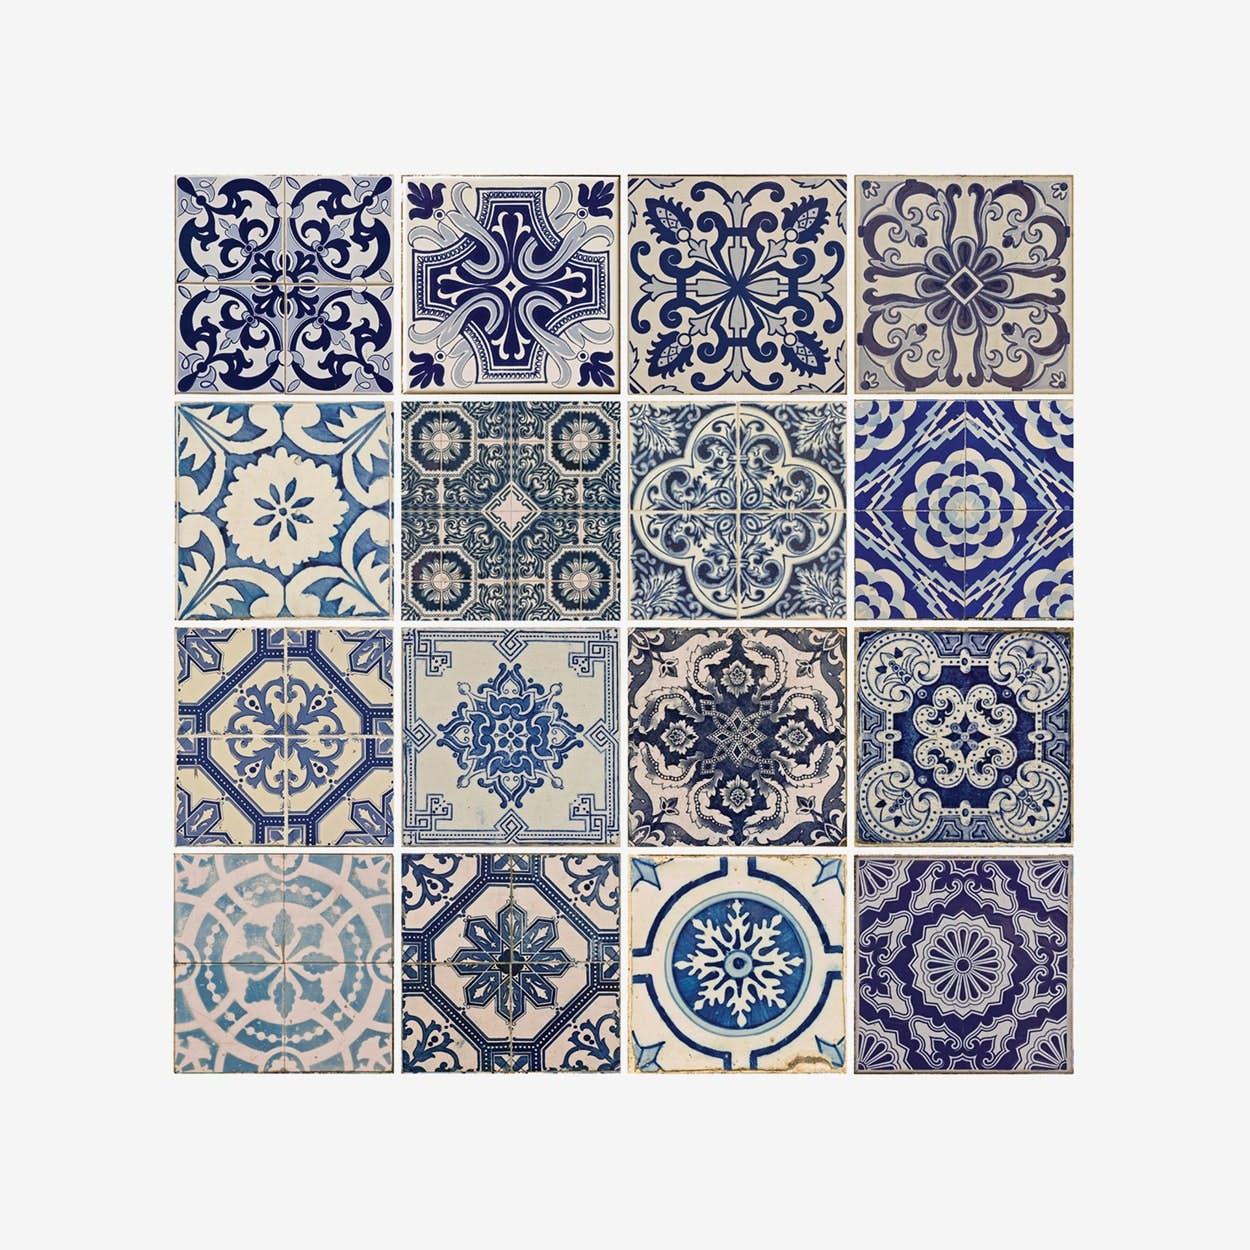 Spanish Blue Tile Pattern Self-adhesive Decal - Walplus